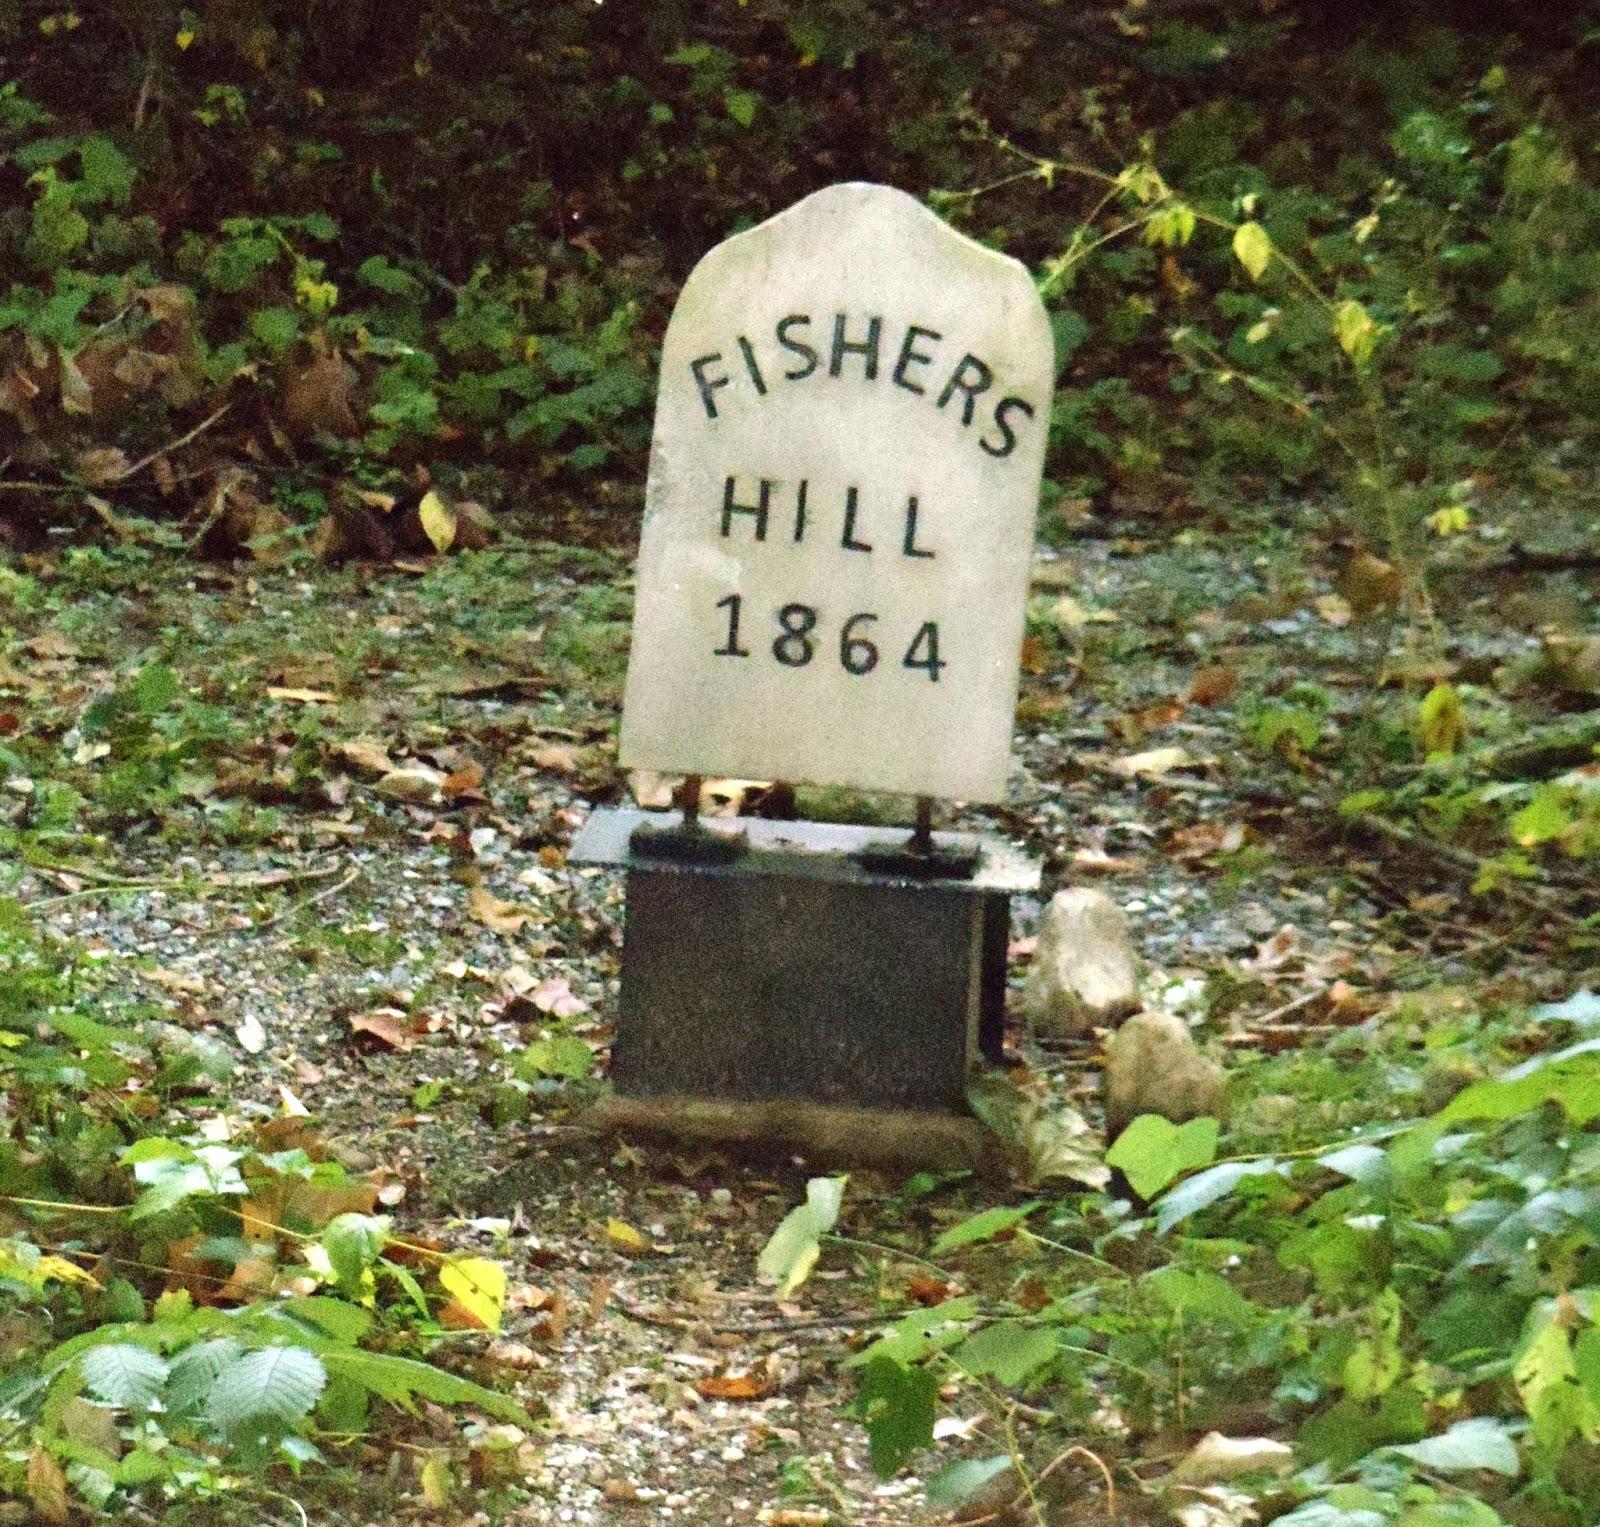 Fishers Hill Marker